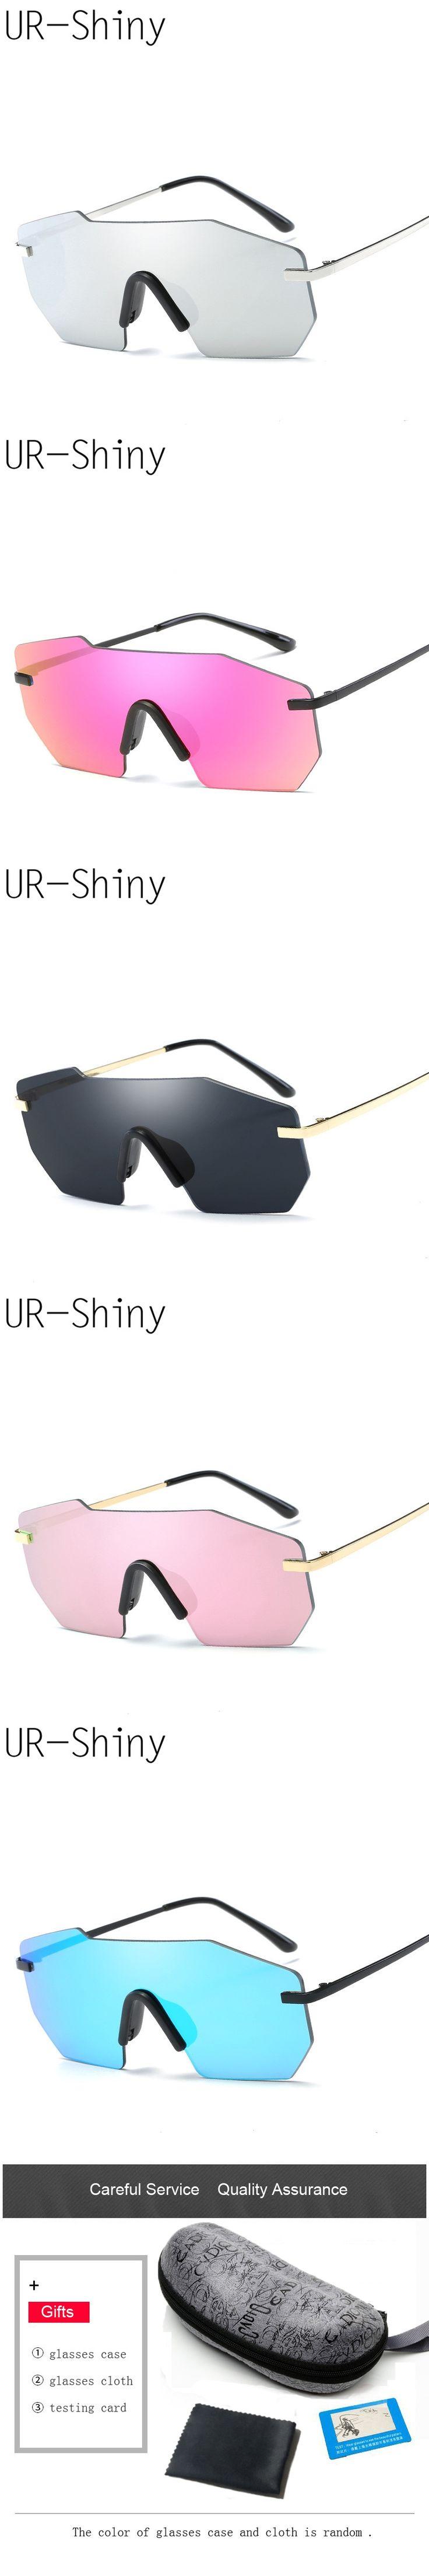 Retro Men Goggle Sunglasses Steampunk 2017 Oversized Mirror Eyewear Sun Glasses Big Frame Sunglasses For Men Women  With Case